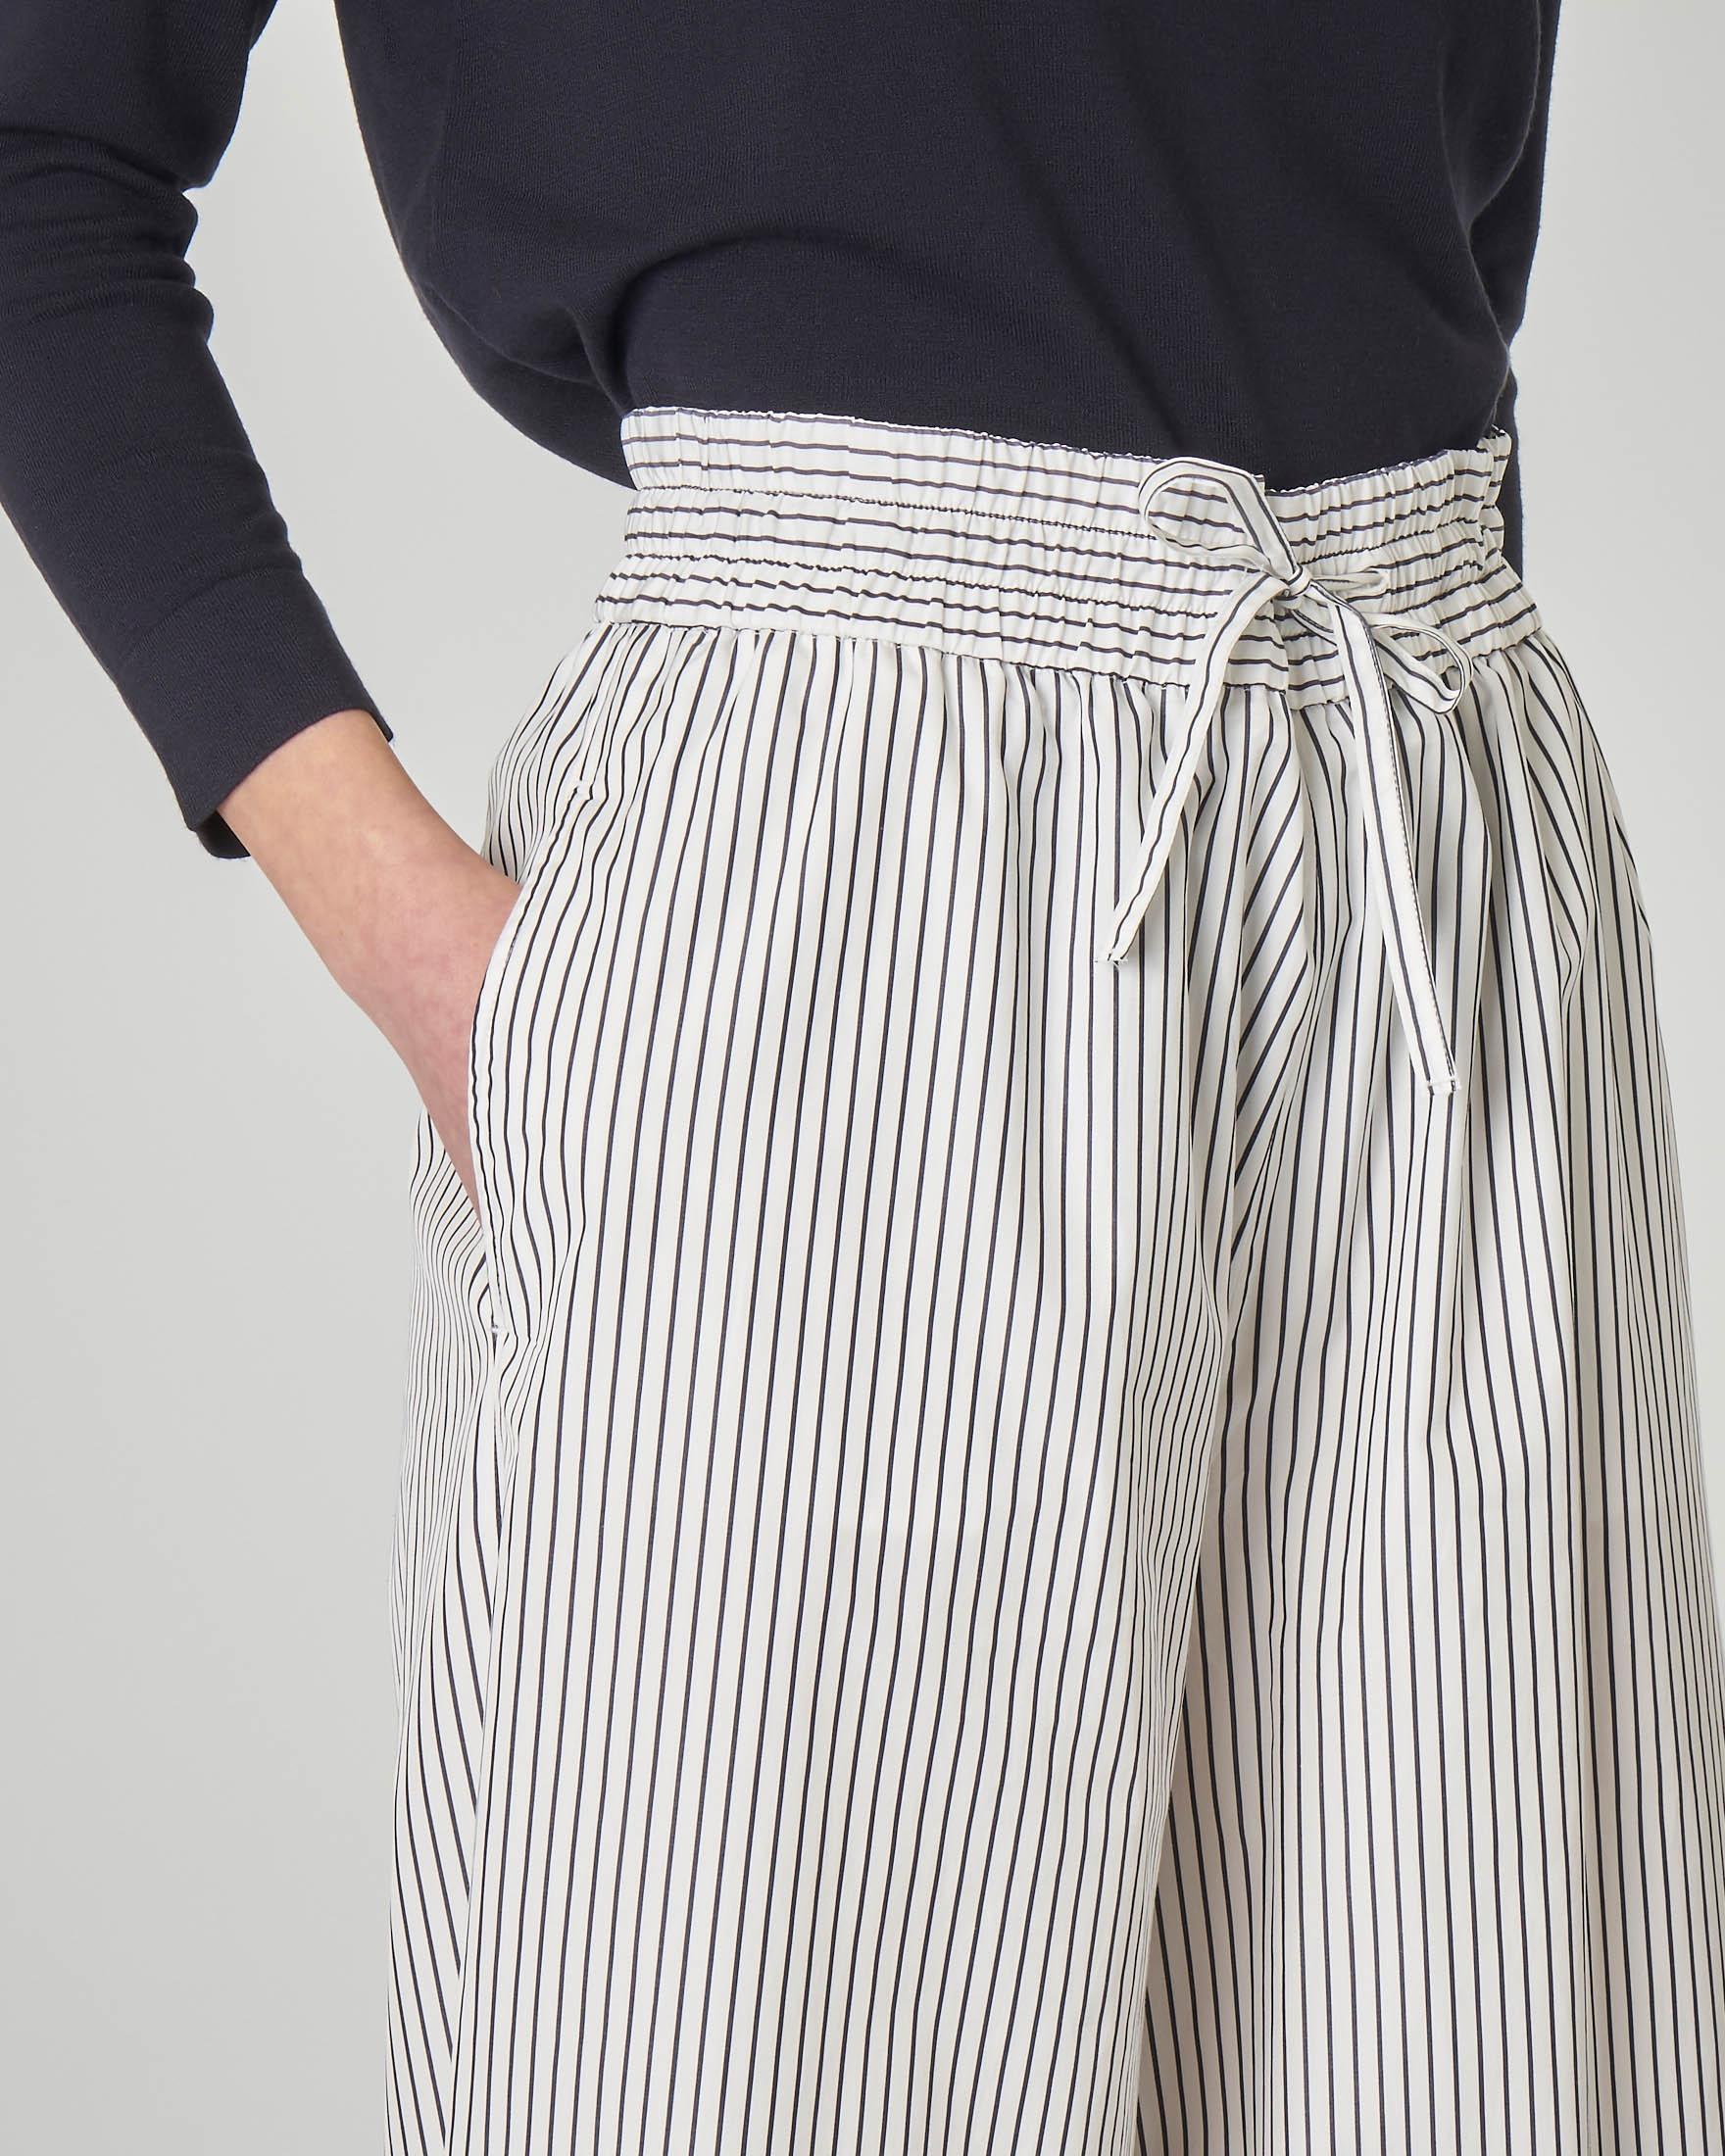 Pantaloni culotte in cotone a righe bianche e blu